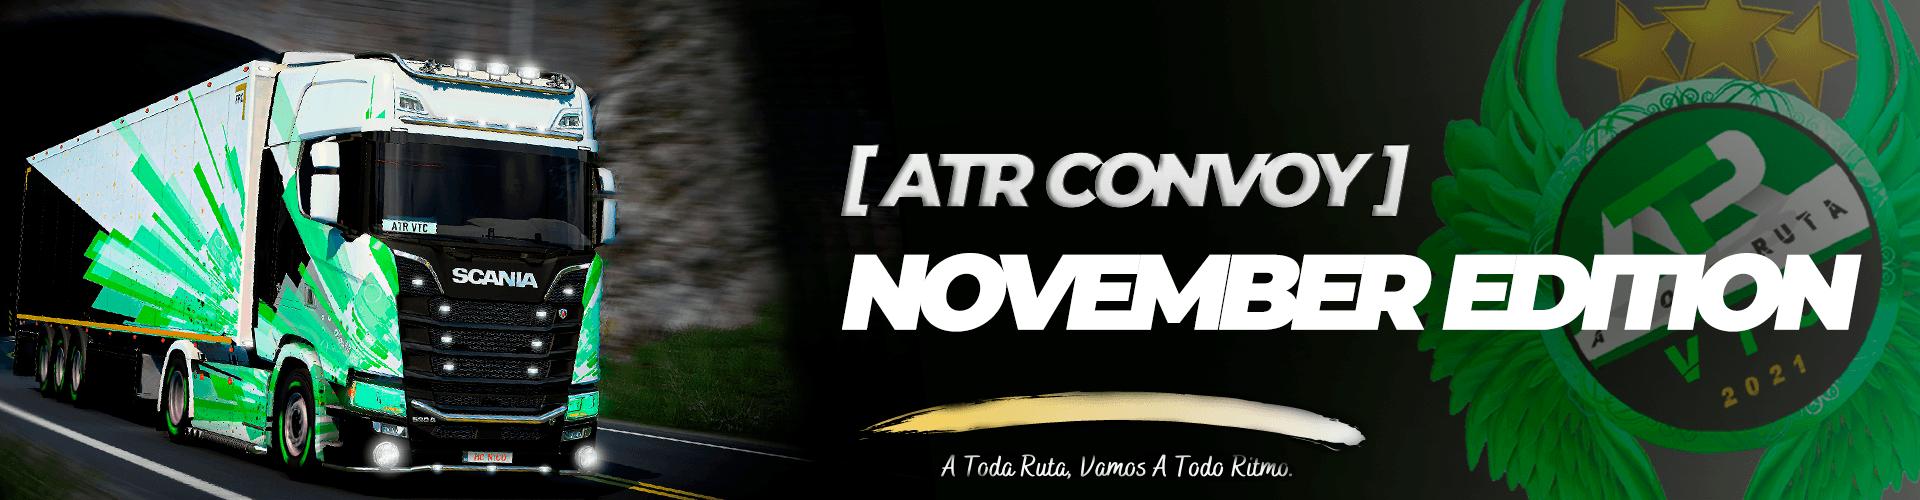 ATR CONVOY -  NOVEMBER EDITION